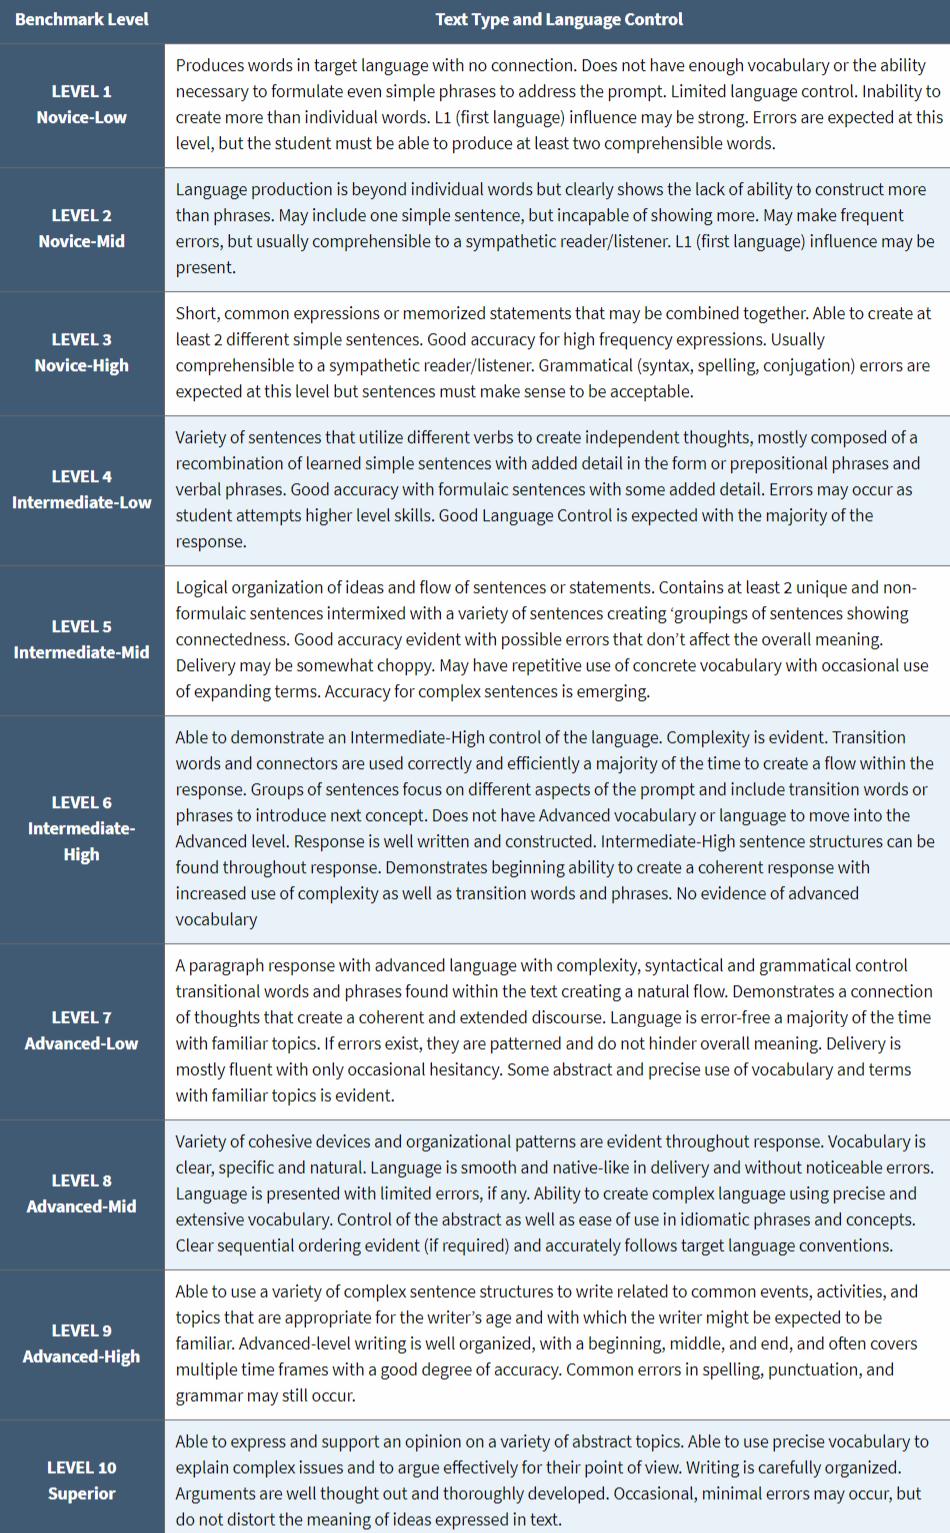 screencapture-avantassessment-apt-proficiency-levels-rubric-guide-2018-10-02-17_04_24.png